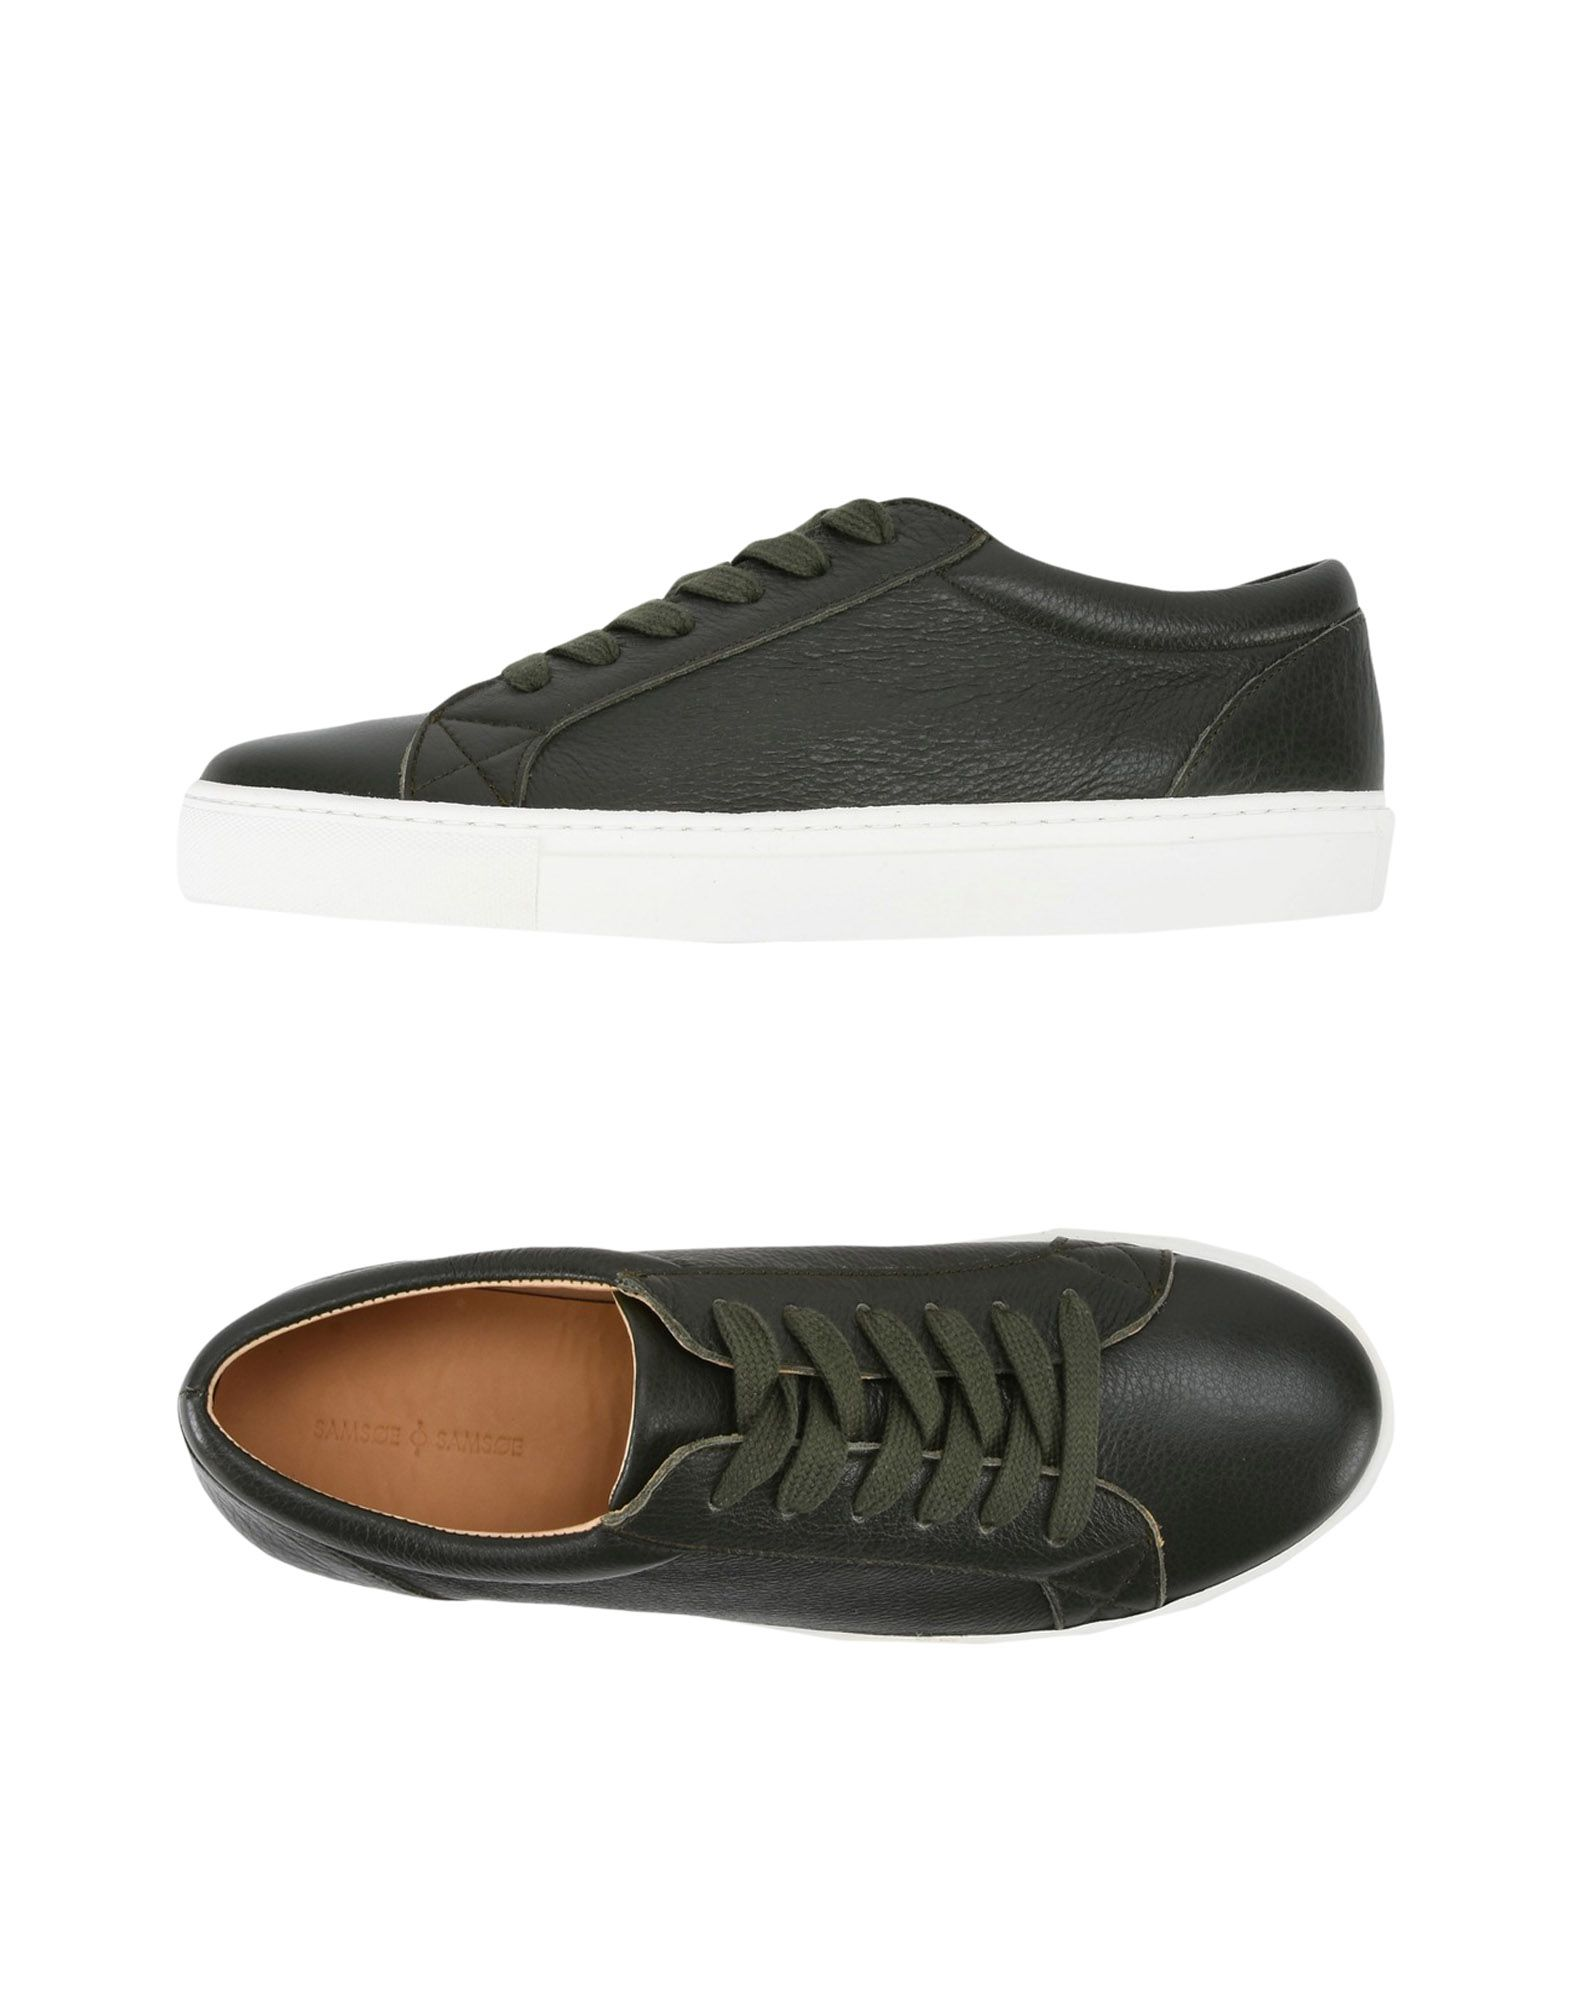 Samsøe Φ Samsøe Papillon 9636 - Sneakers - Men Samsøe on Φ Samsøe Sneakers online on Samsøe  Canada - 11444121GN bb23a3